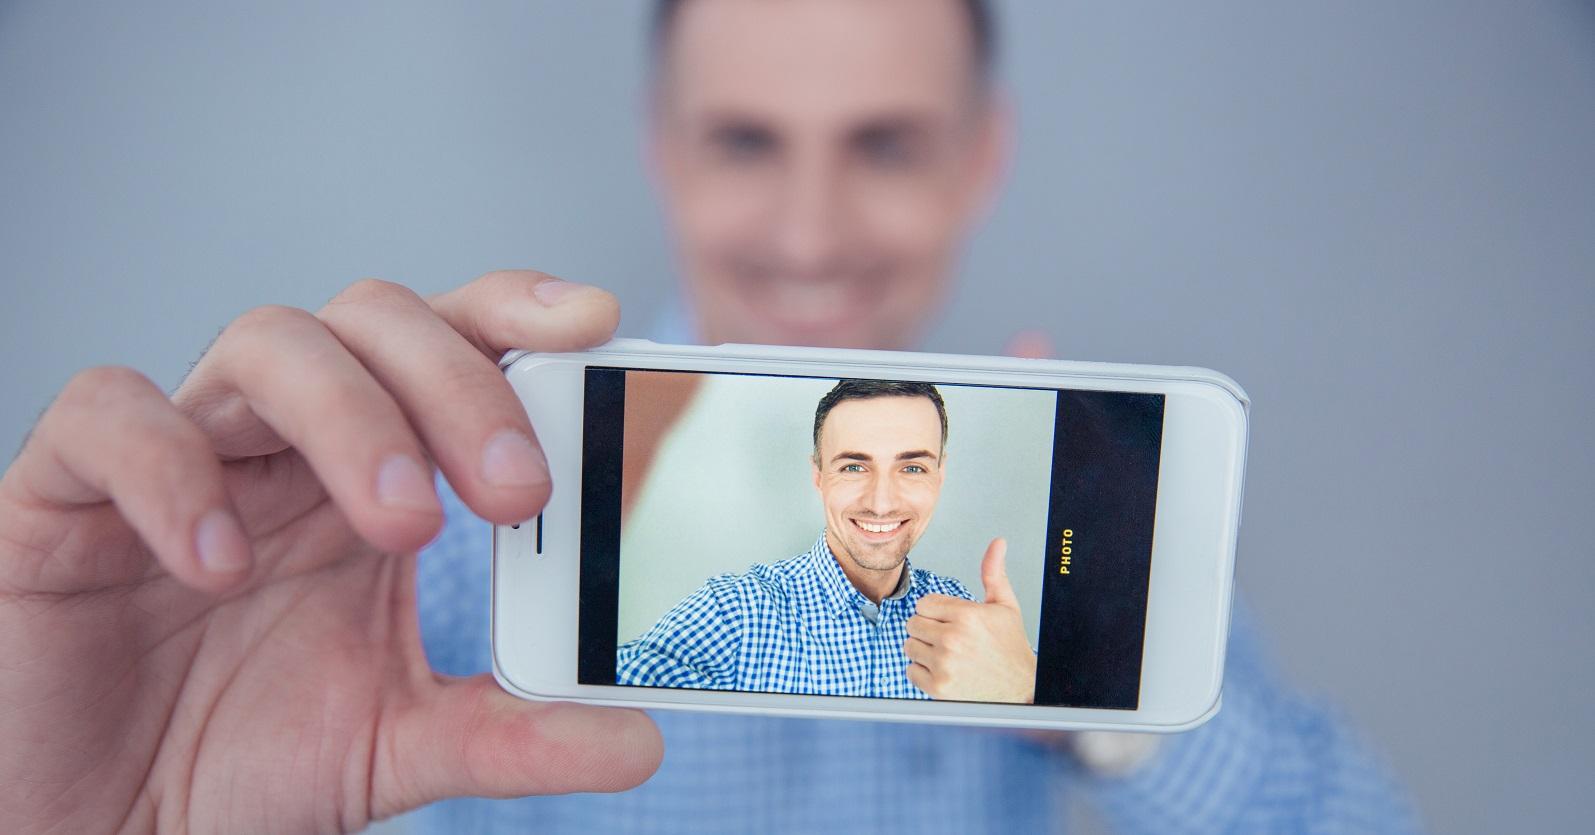 Video Testimonial Examples showing man making video testimonial on cell phone